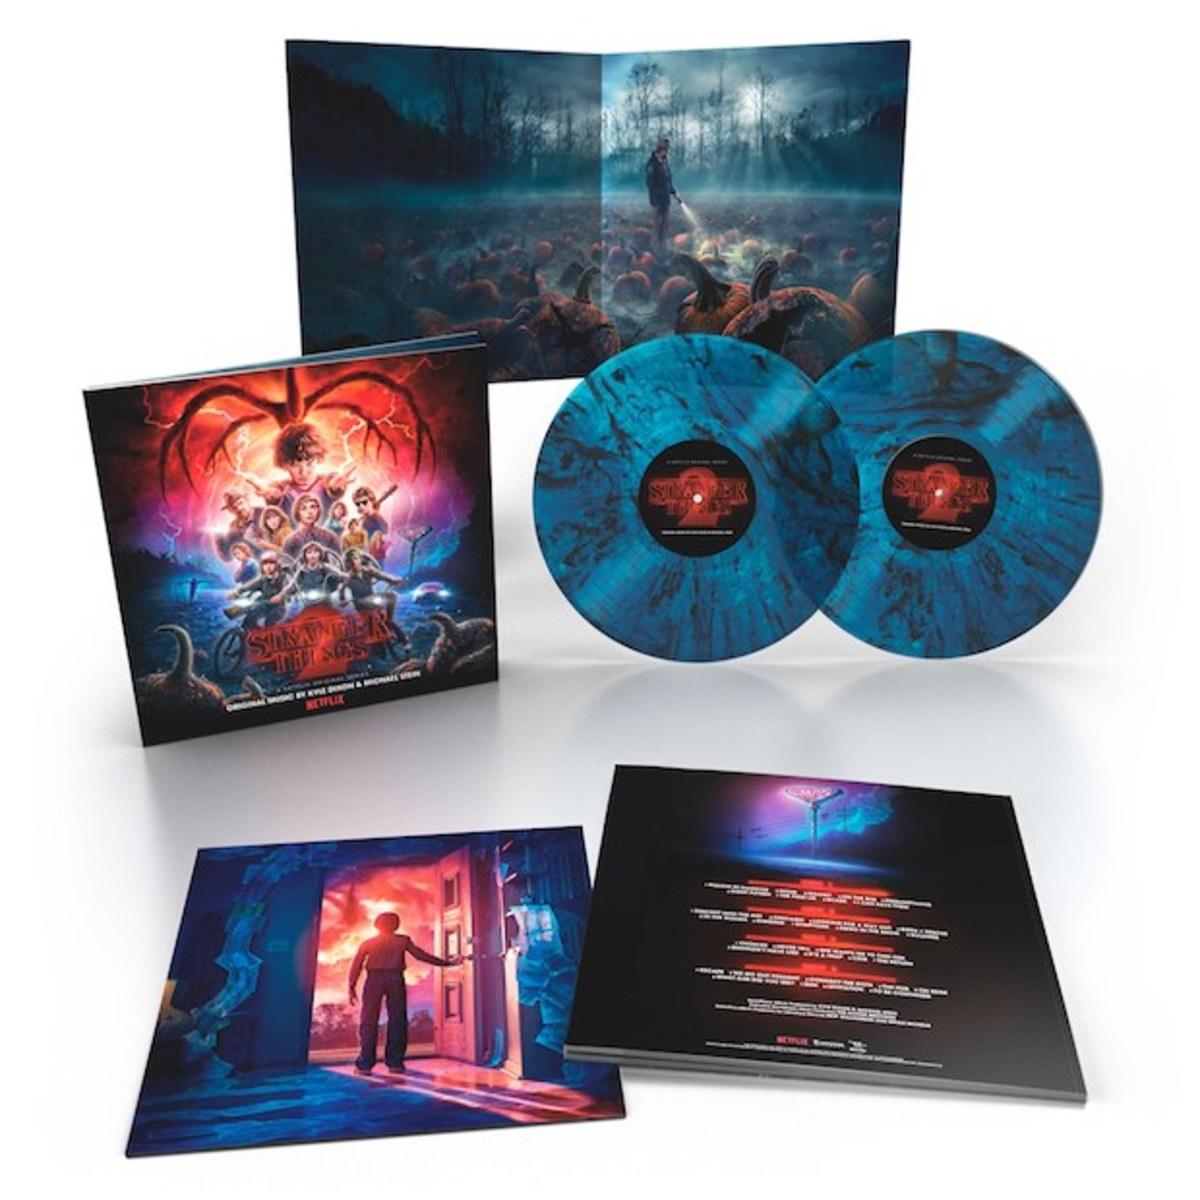 Stranger Things Soundtrack Season 2 Box Set